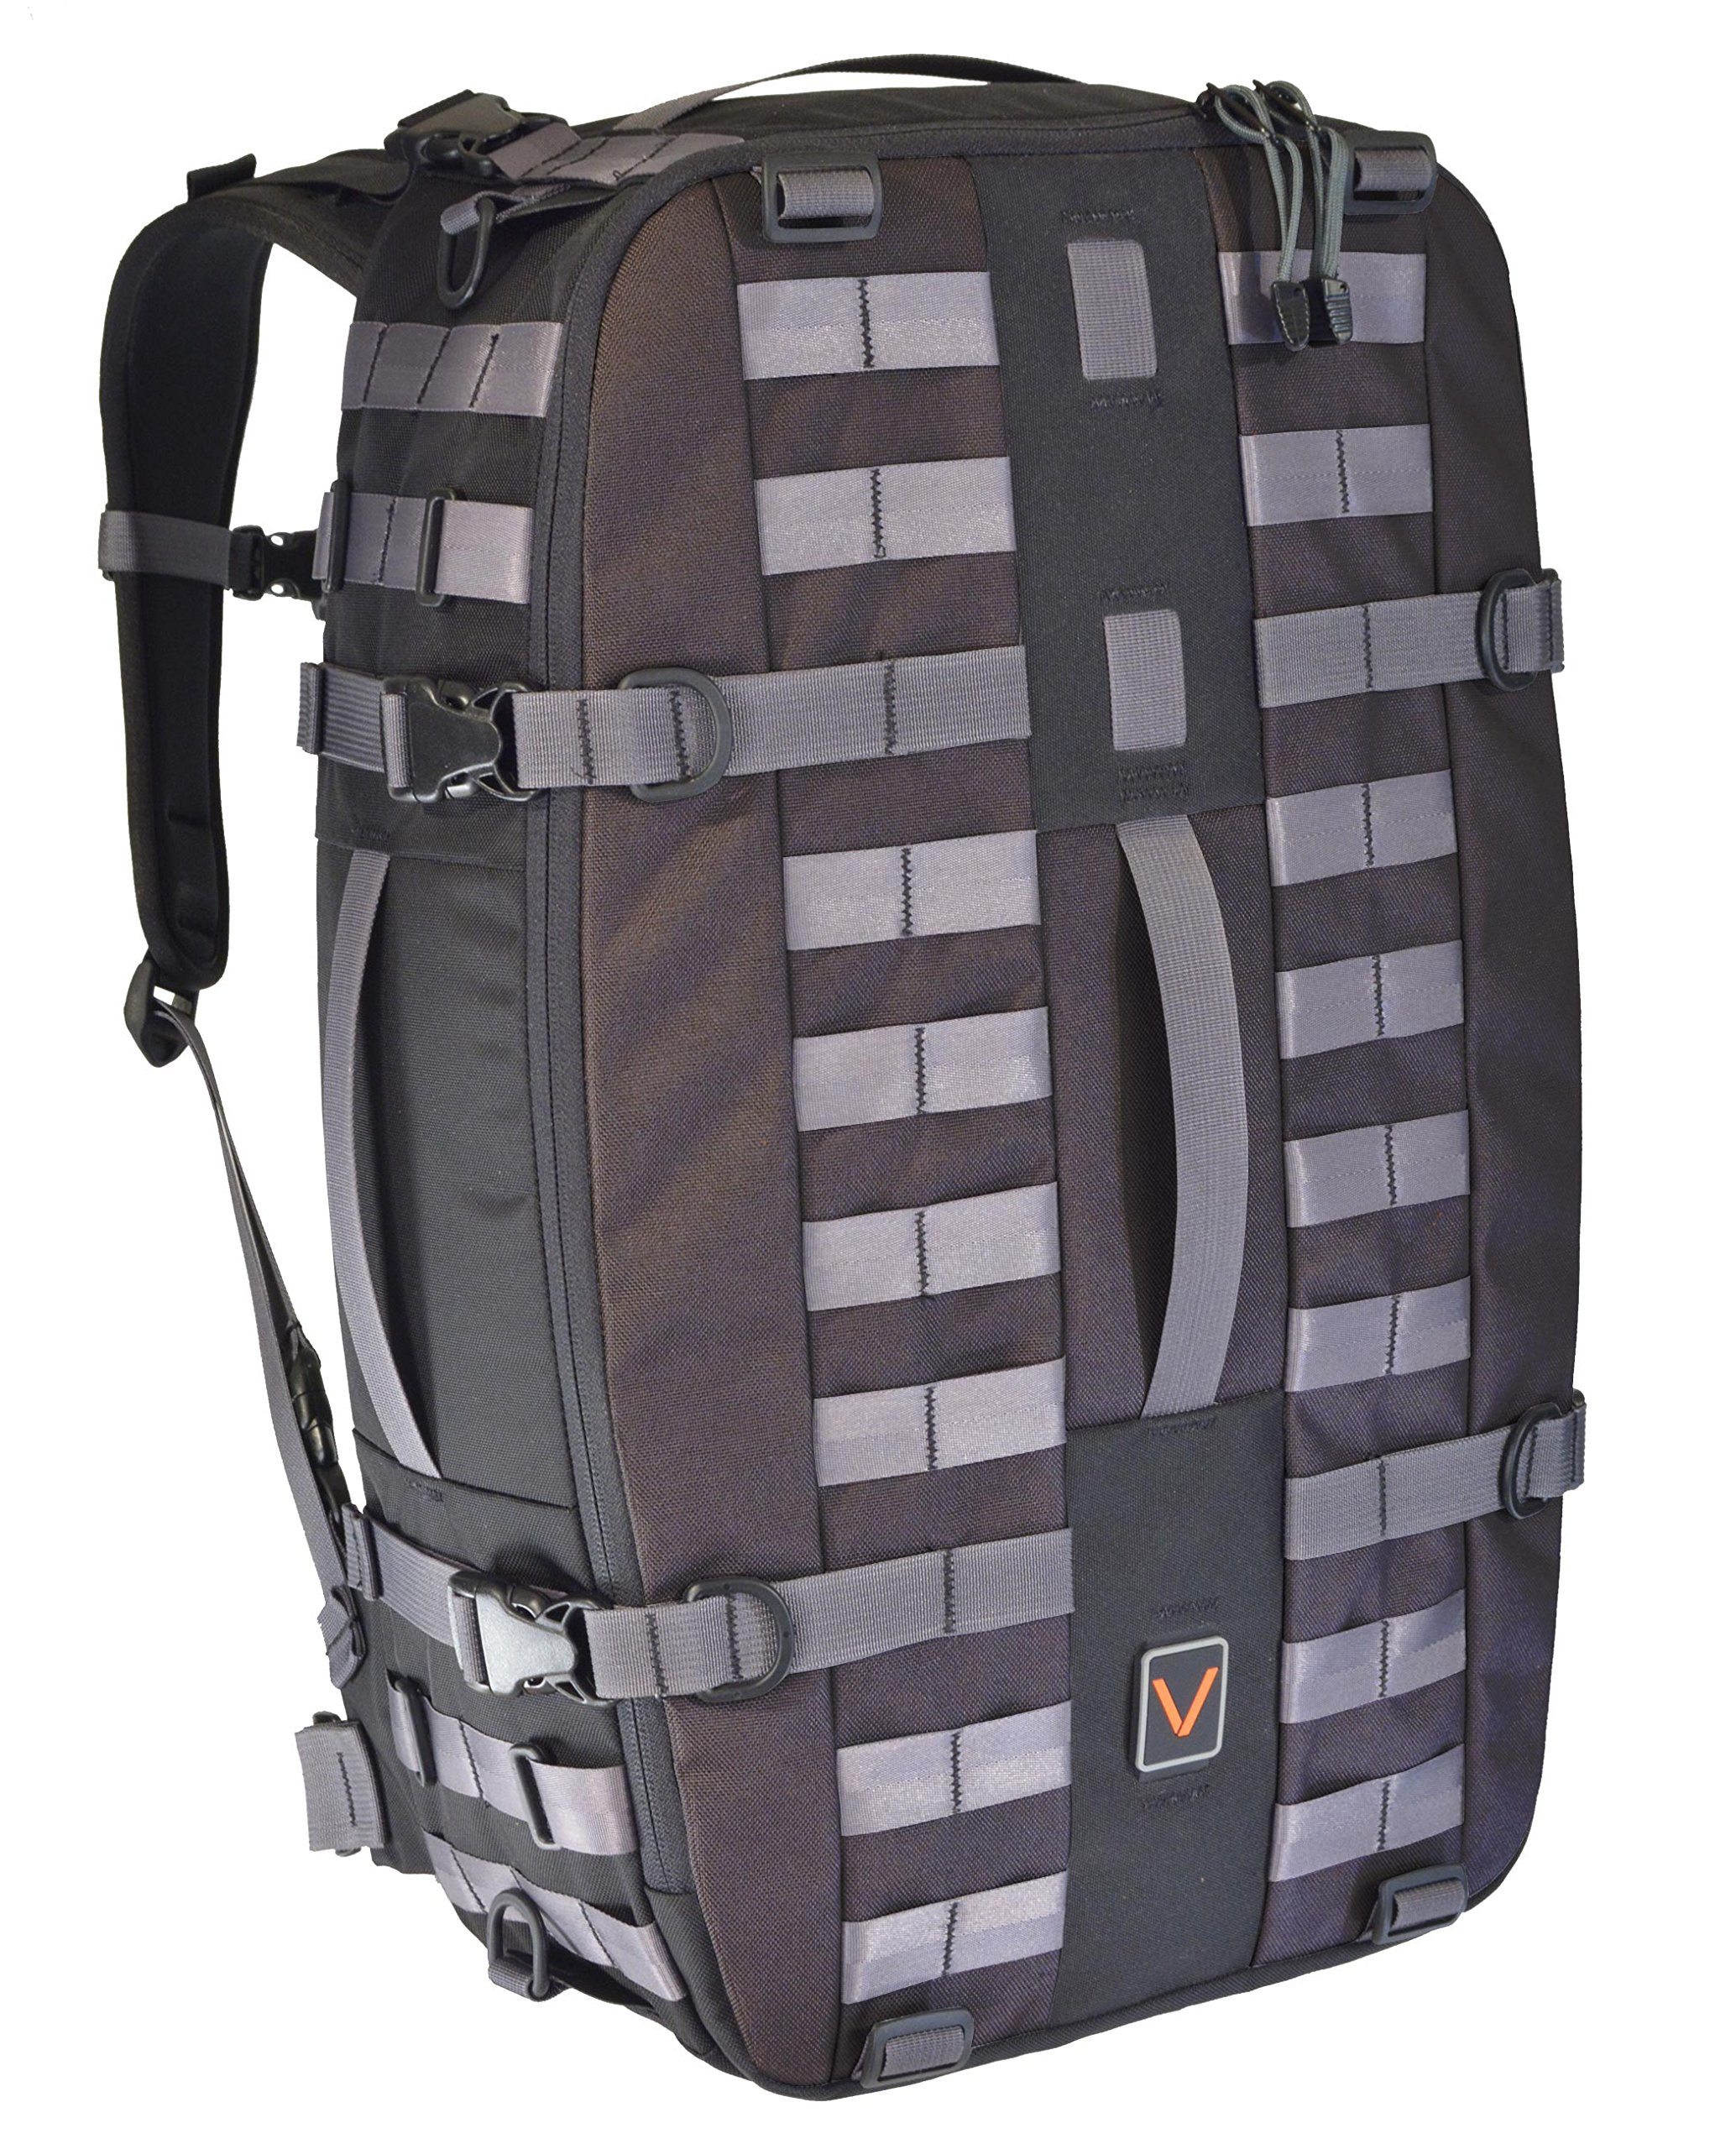 Vital Gear 2017CAVU35MLBLK Modular Travel Get Home Backpack, Men's Large, Black by VITAL GEAR